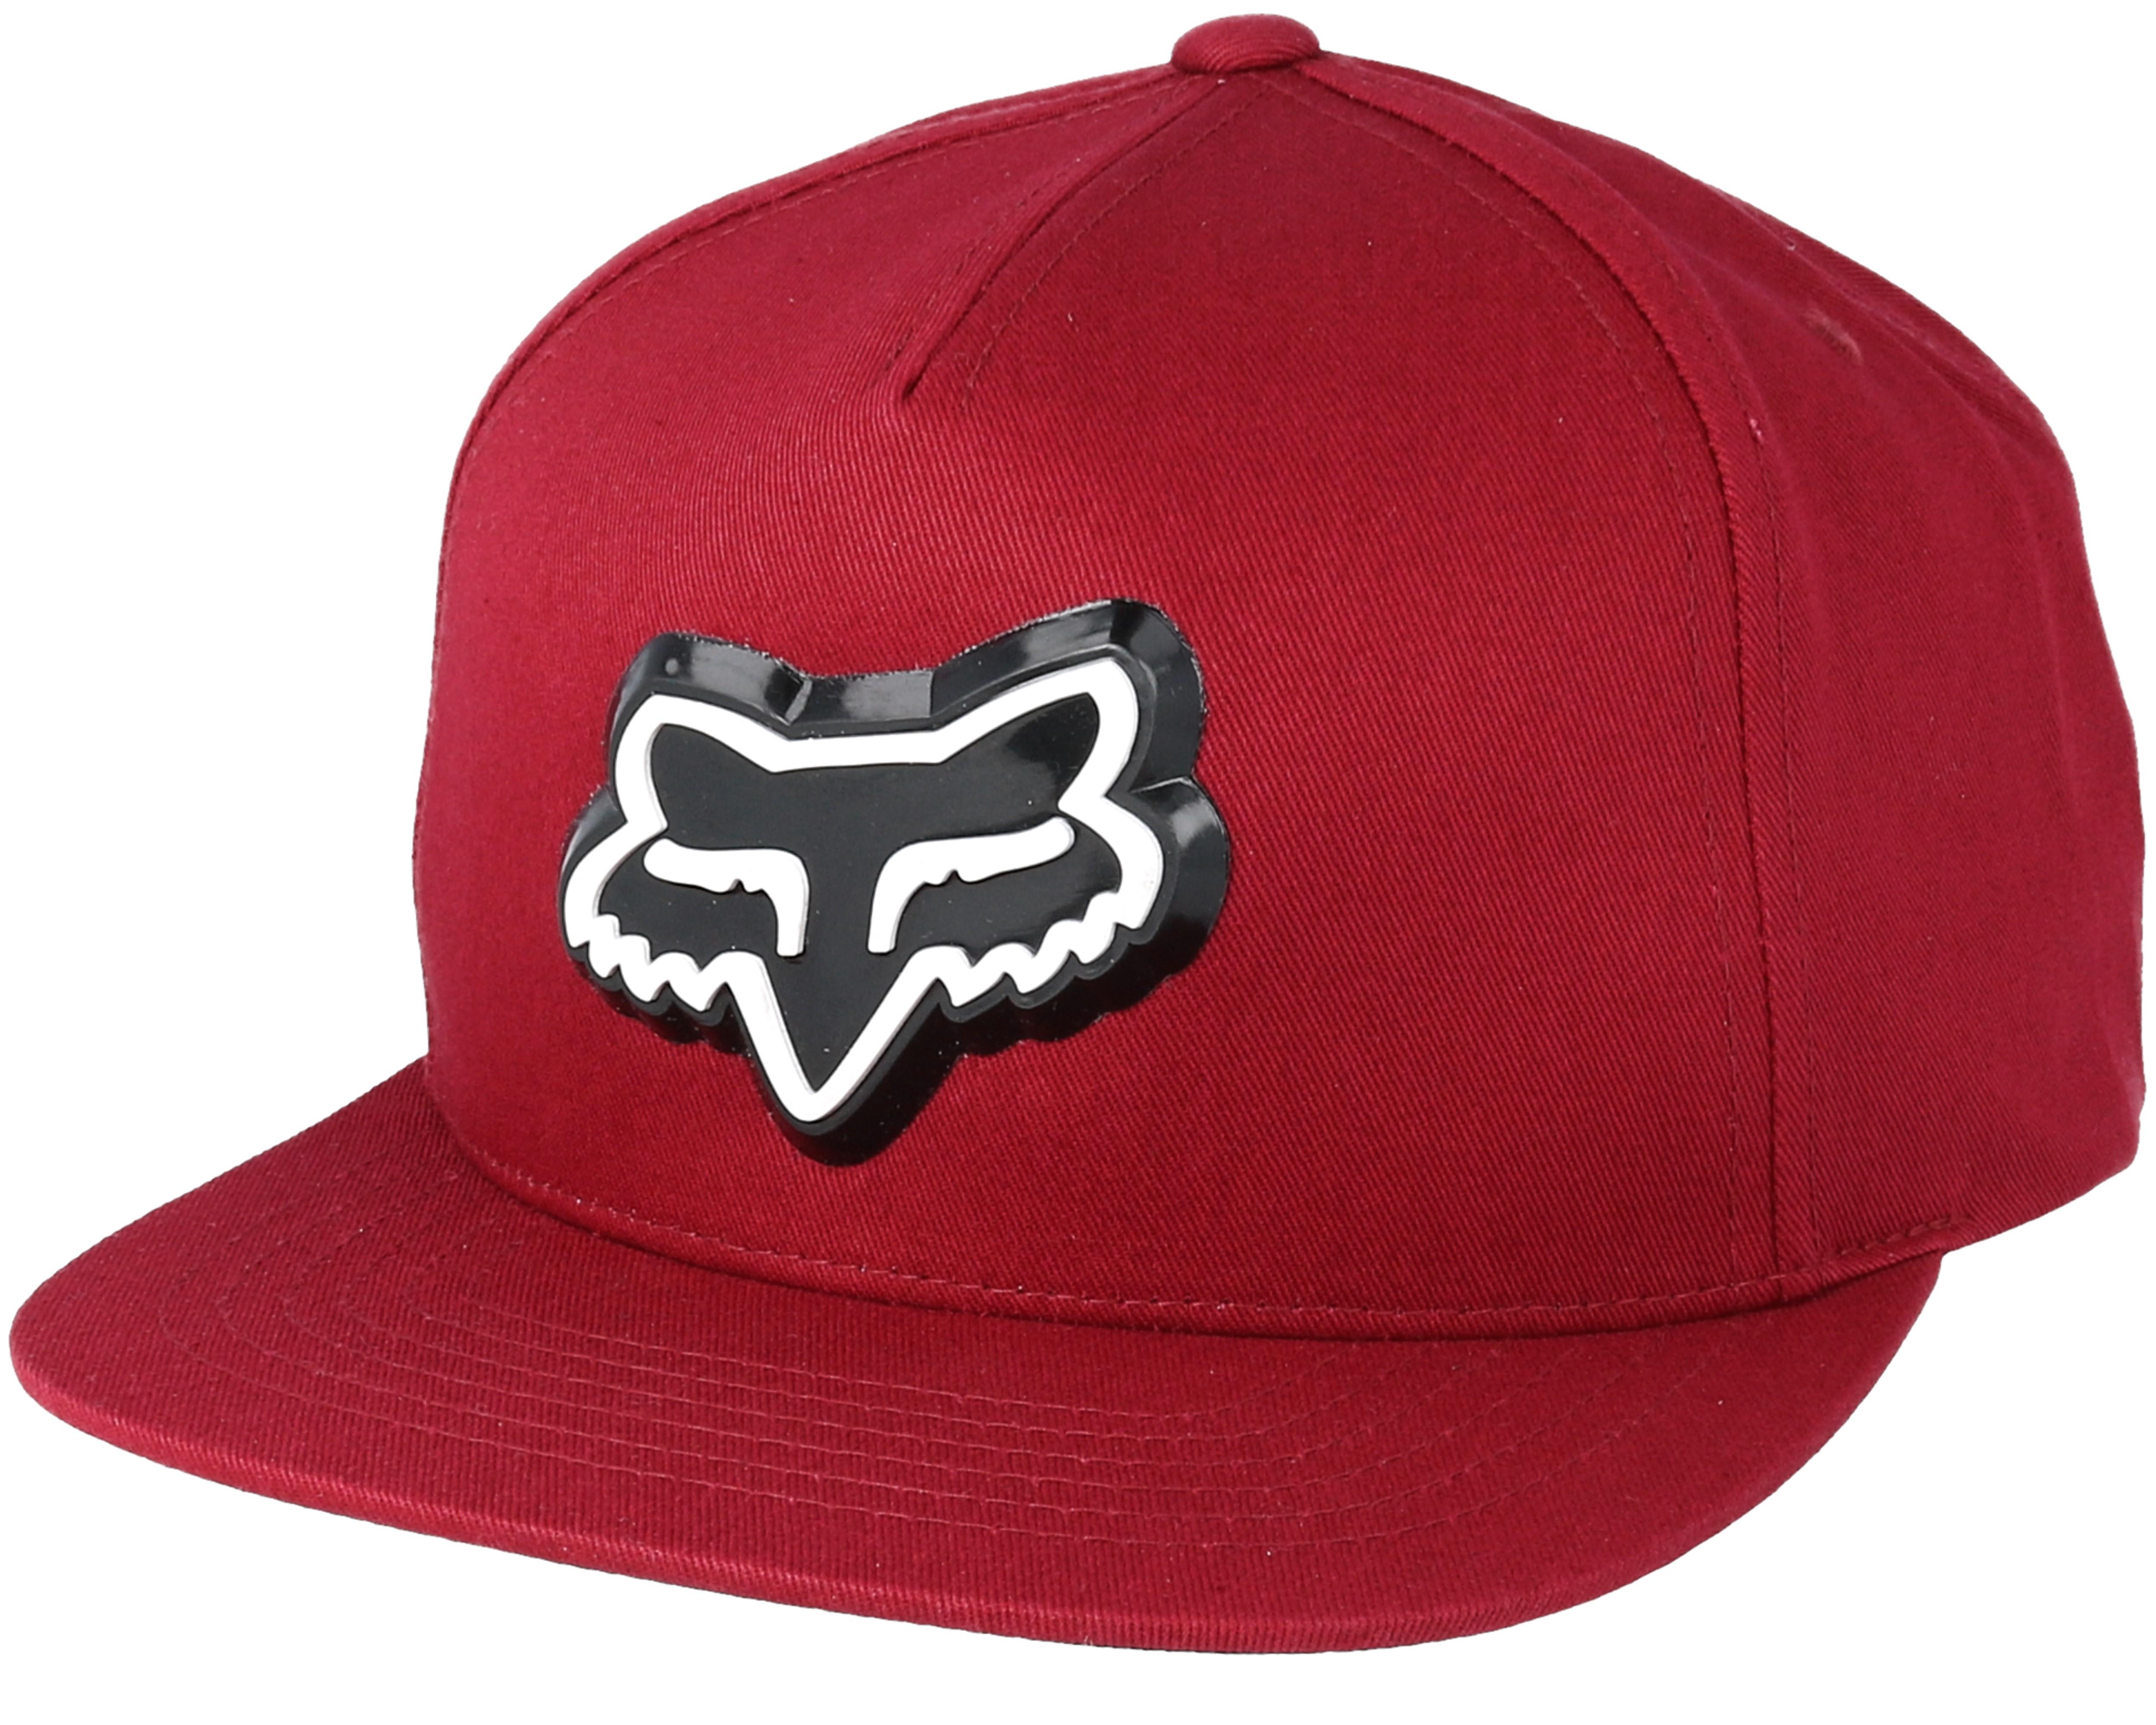 88000aec8f35 Ingratiate Red Snapback - Fox caps   Hatstore.co.uk